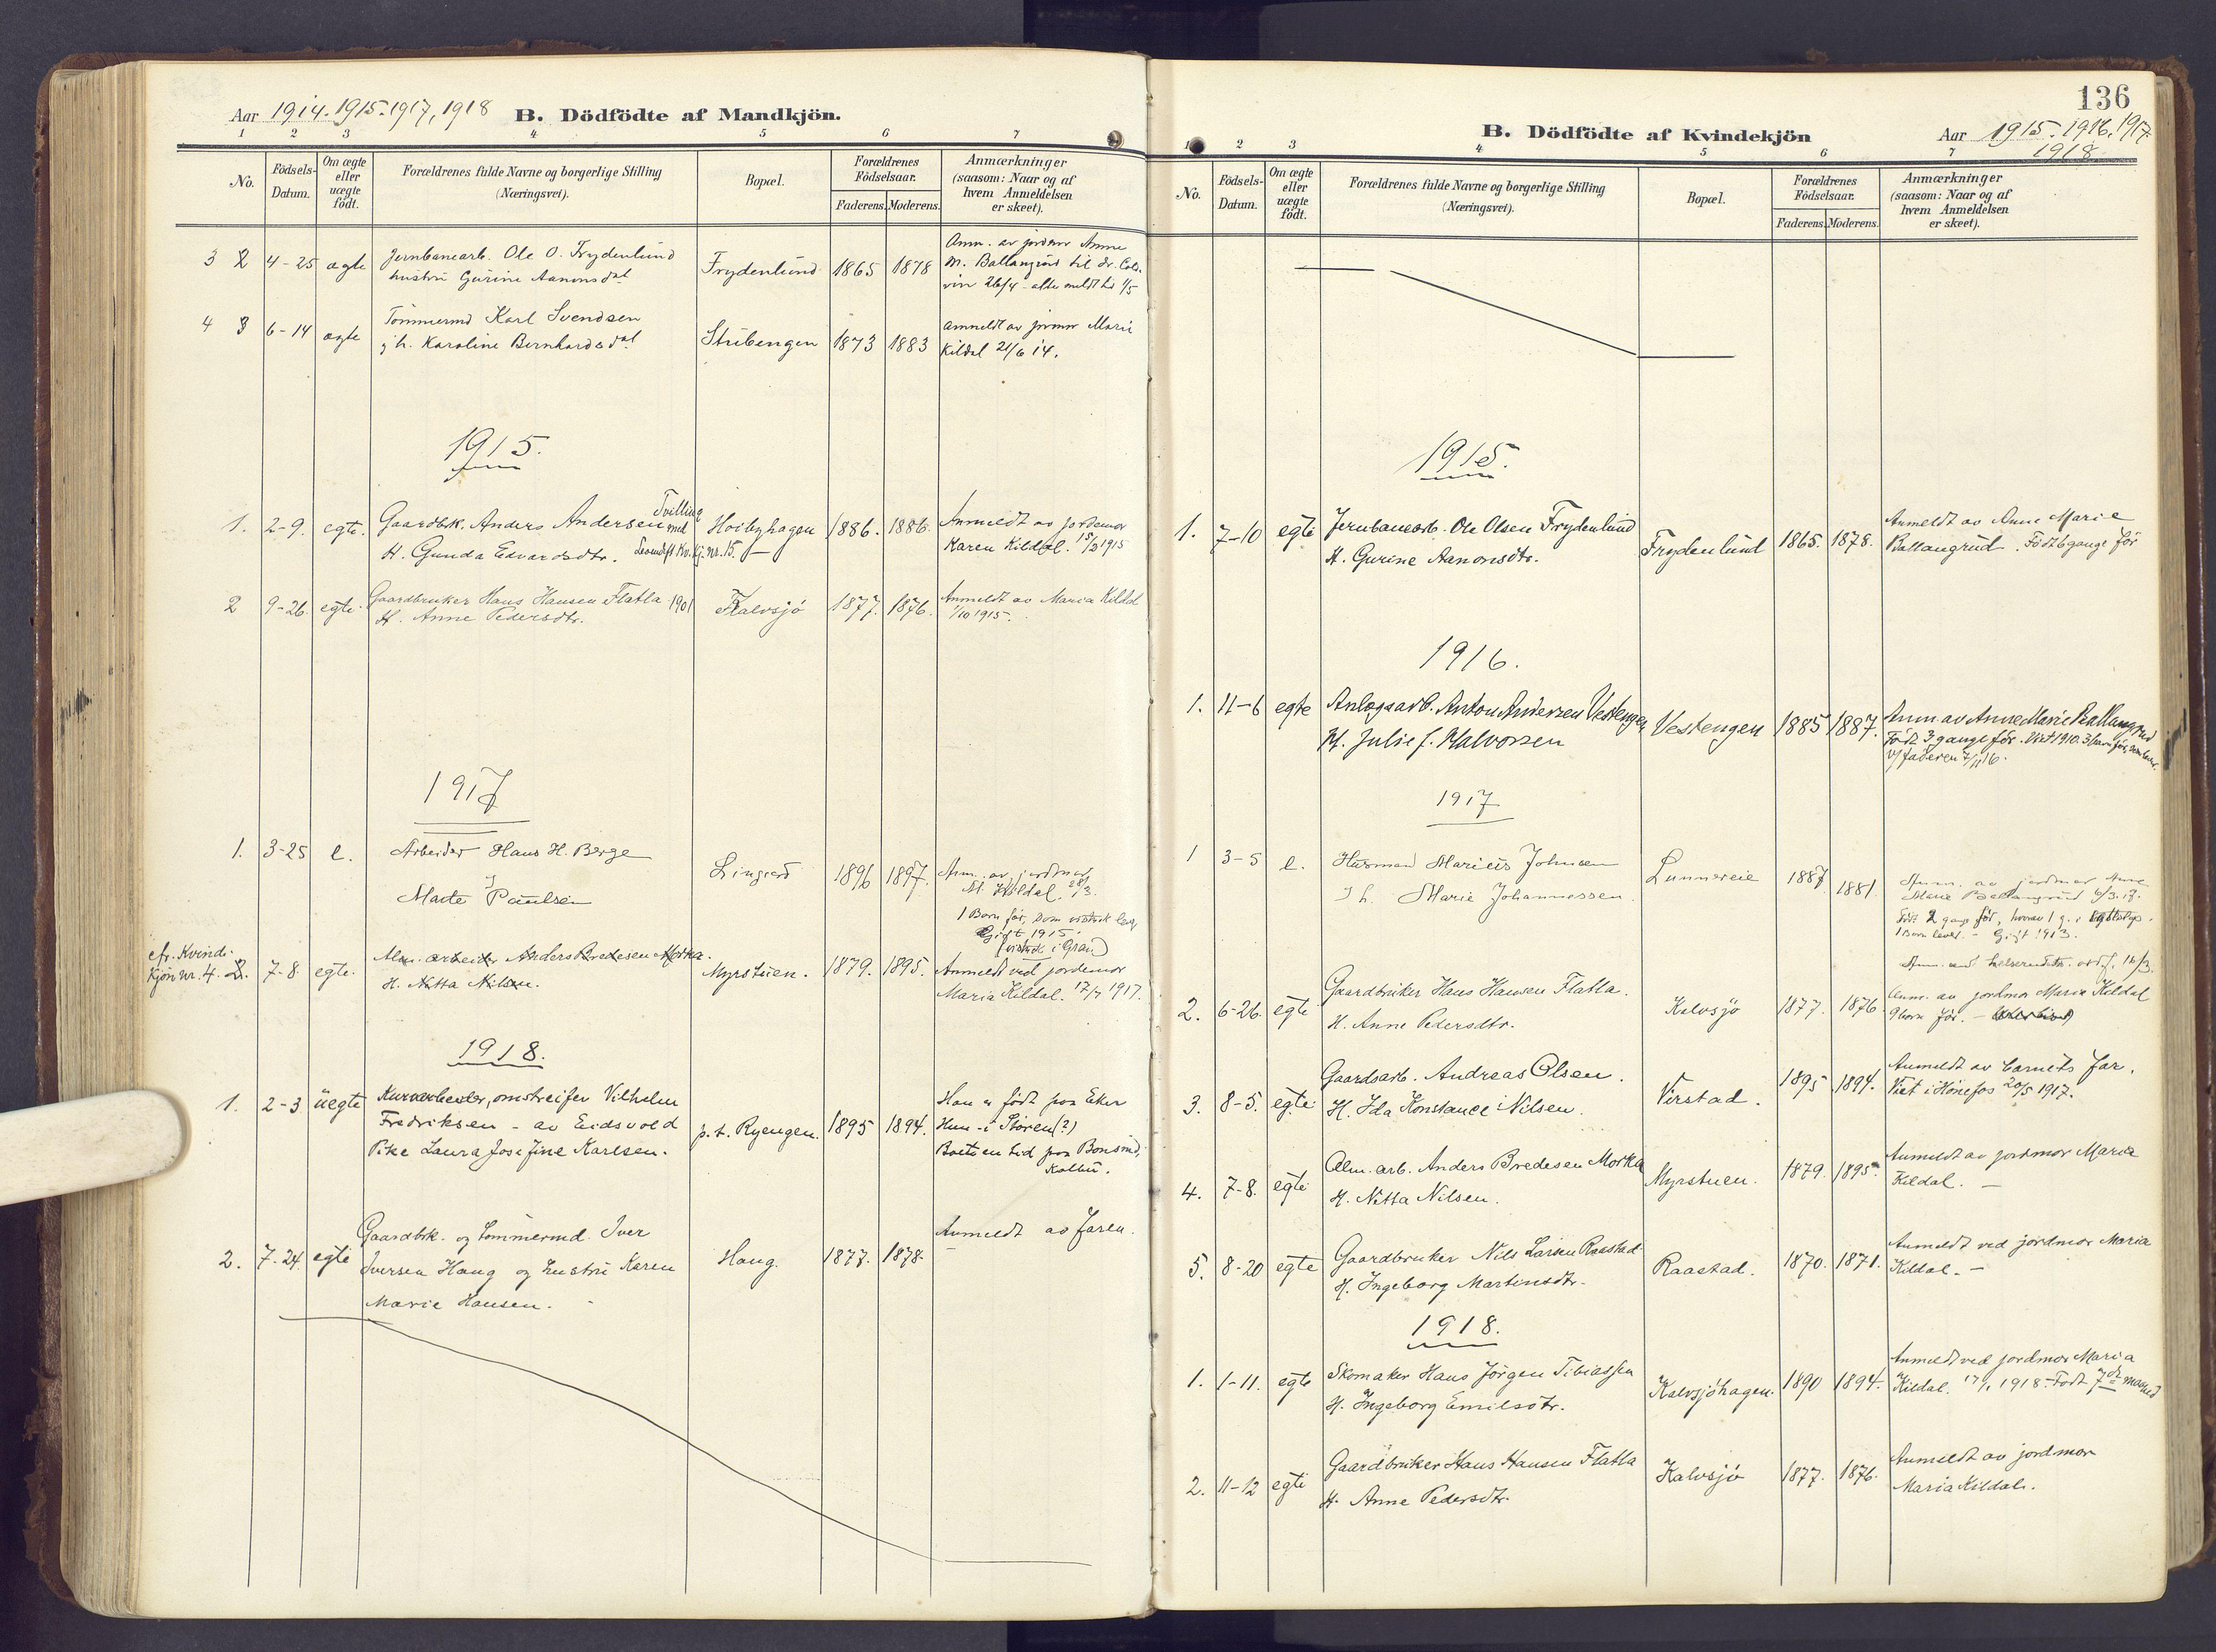 SAH, Lunner prestekontor, H/Ha/Haa/L0001: Ministerialbok nr. 1, 1907-1922, s. 136